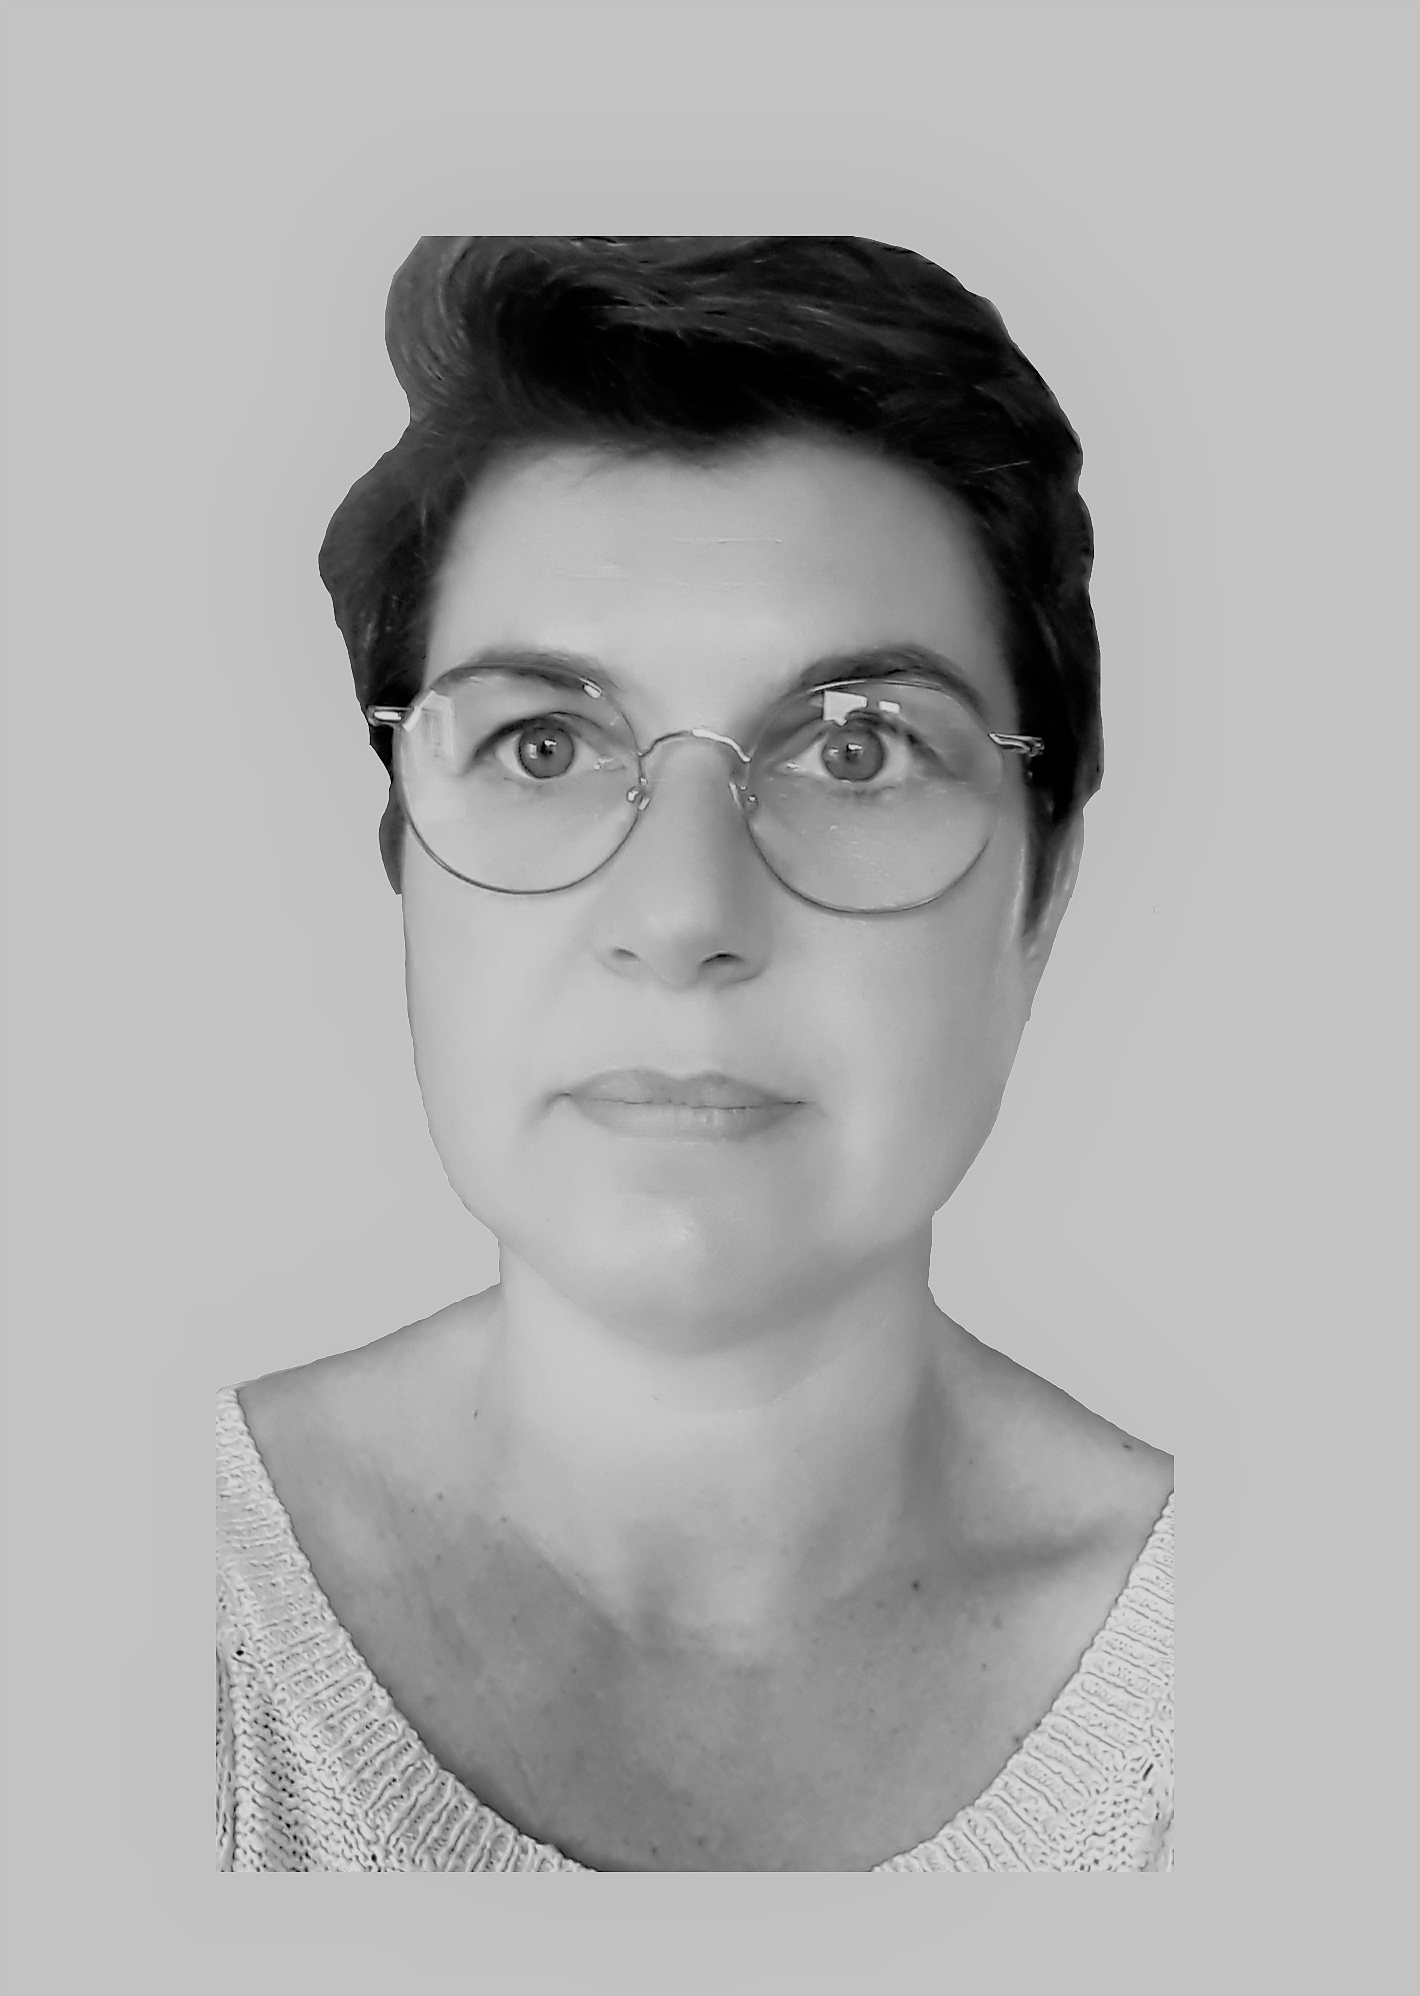 Elise broquaire